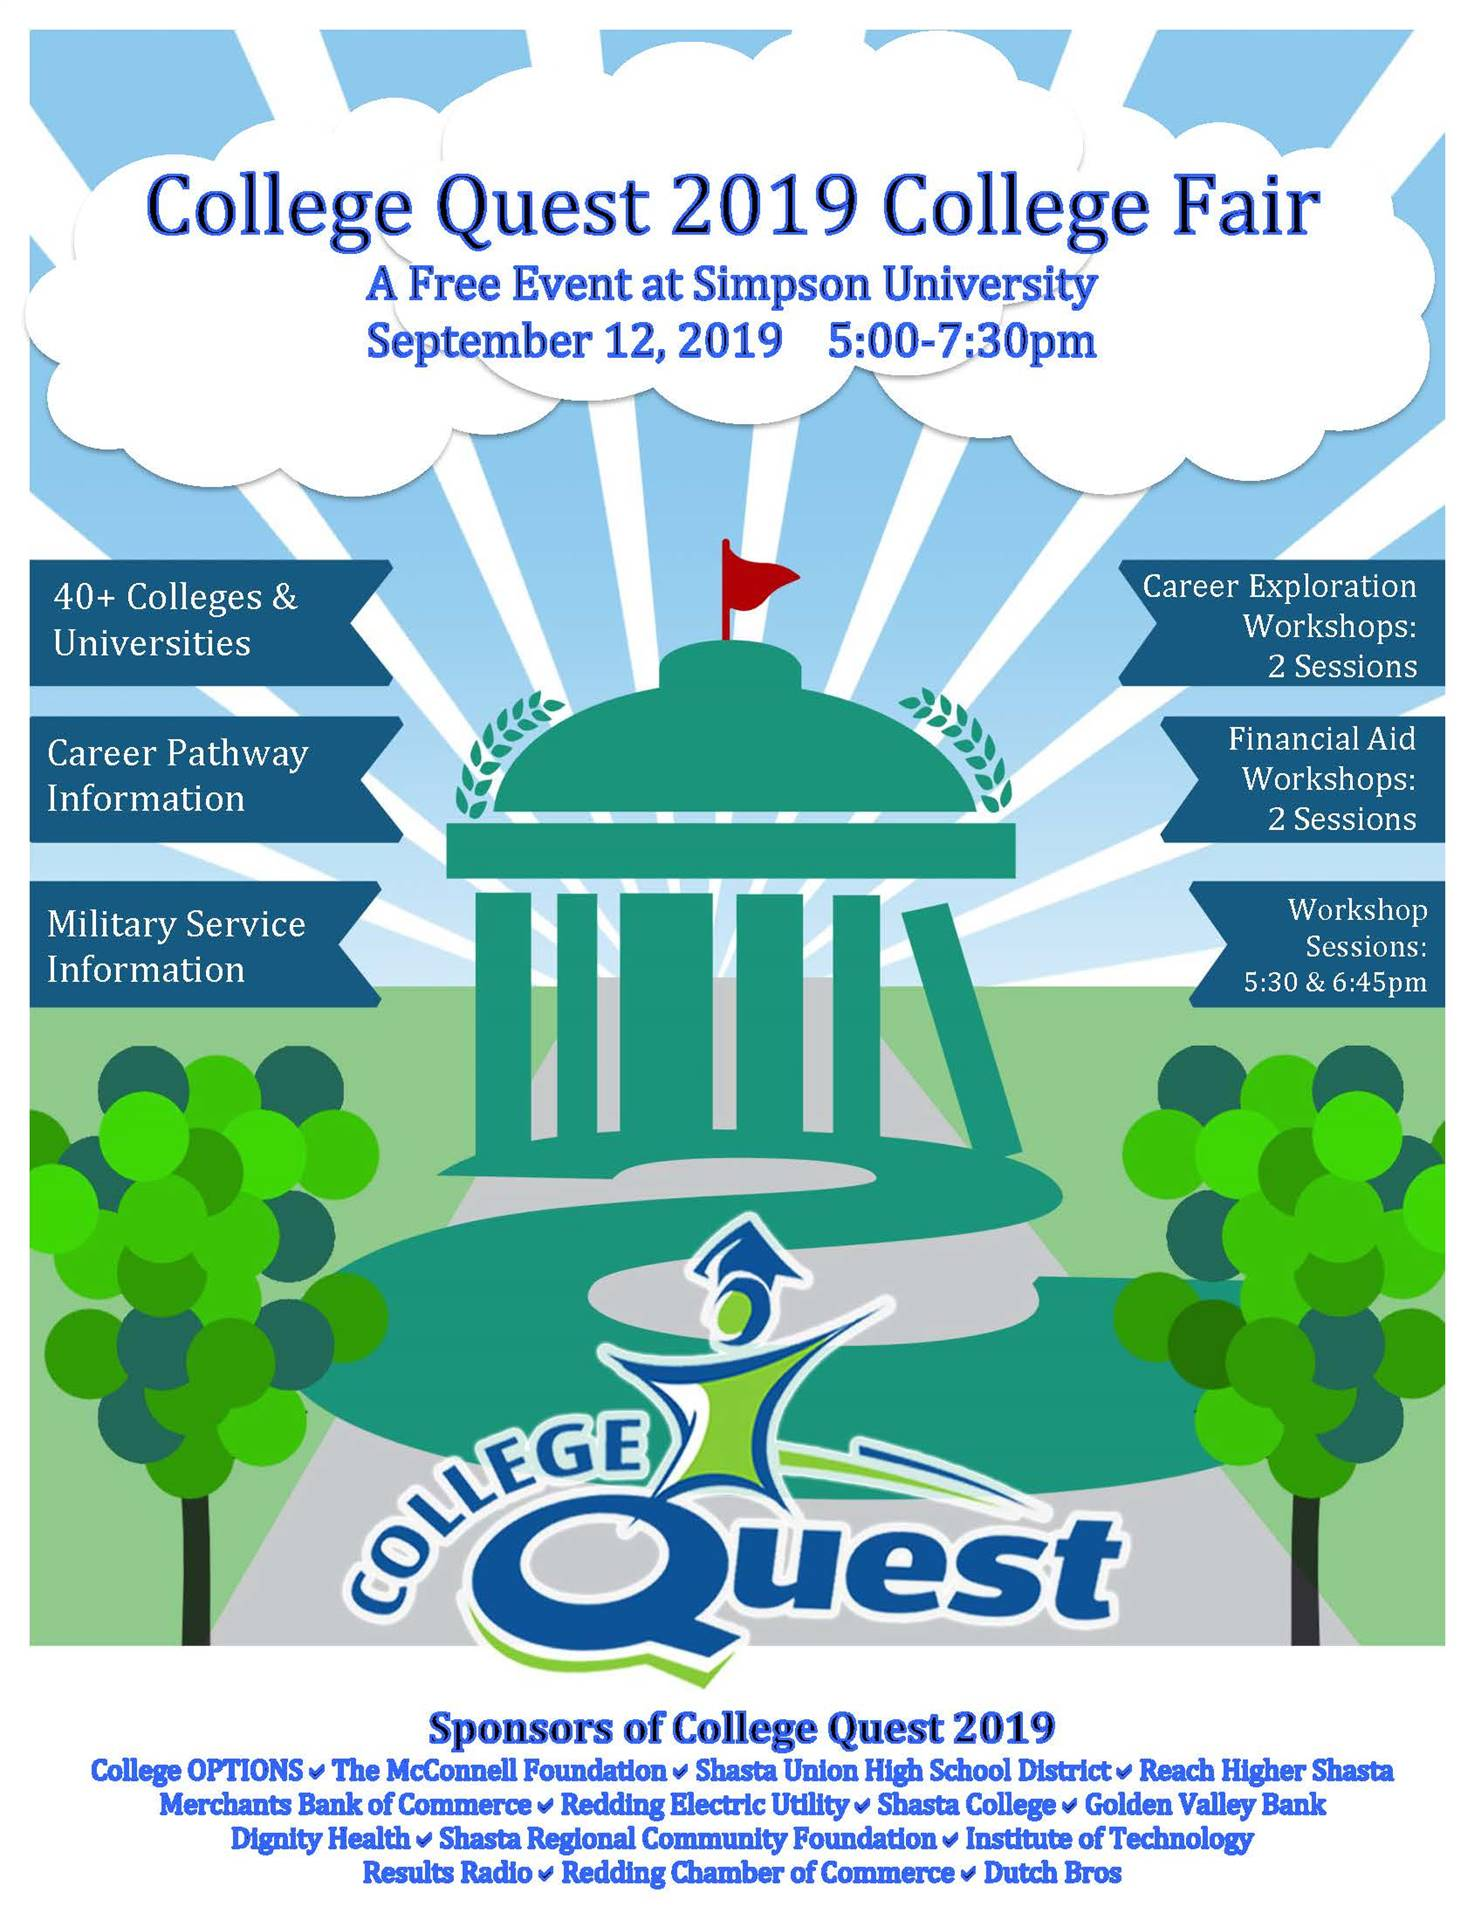 College Quest